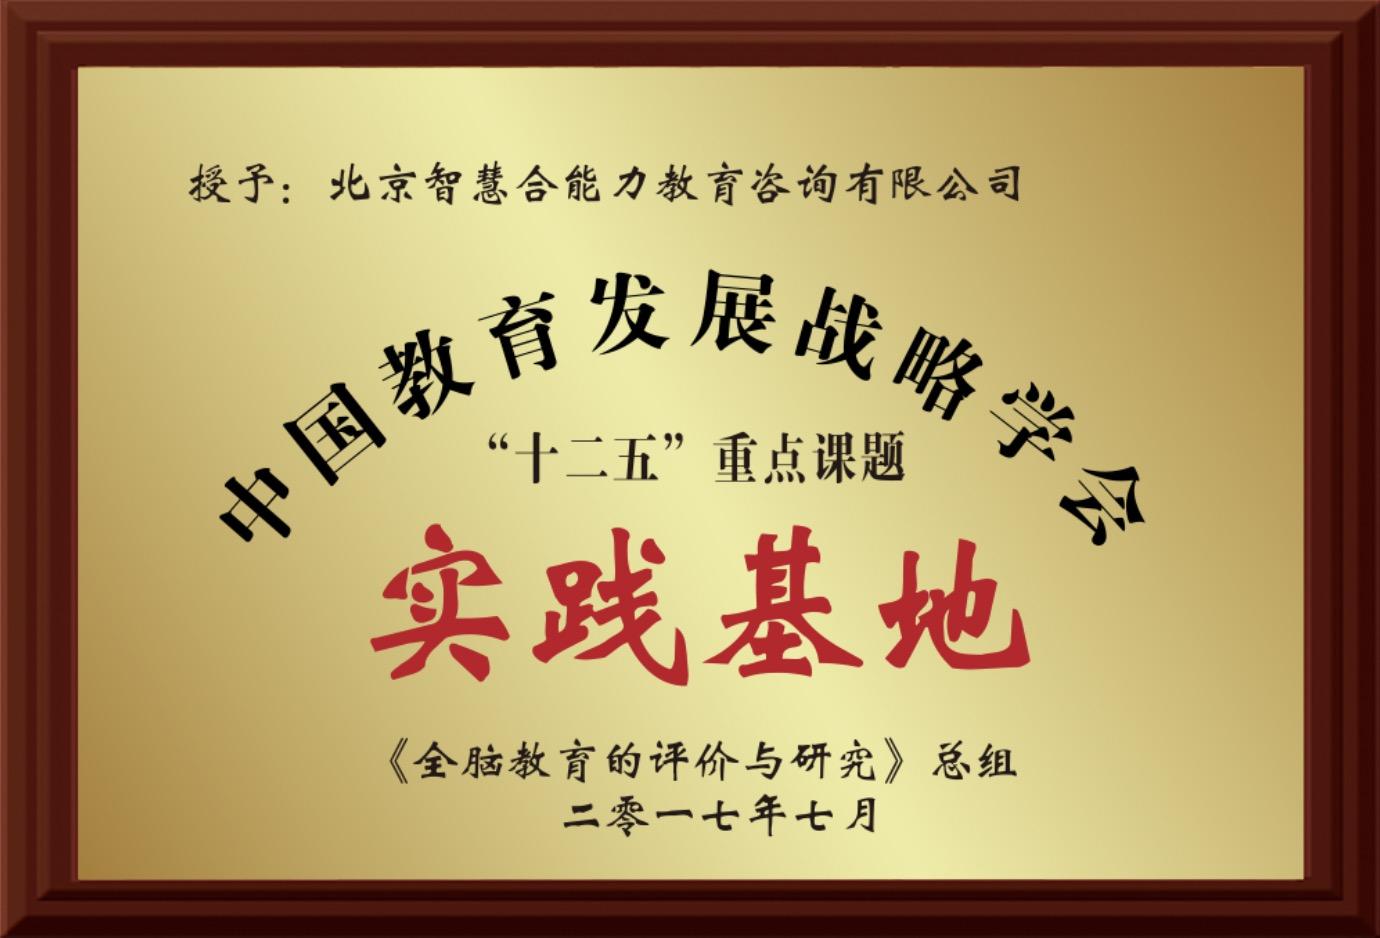 "<span style=""color:#FFFFFF;font-size:14px;"">《全脑教育的评价与研究》总组二零一七年七月授予北京智慧很能力教育咨询有限公司中国教育发展战略学会""十二五""重点课题实践基地</span>"